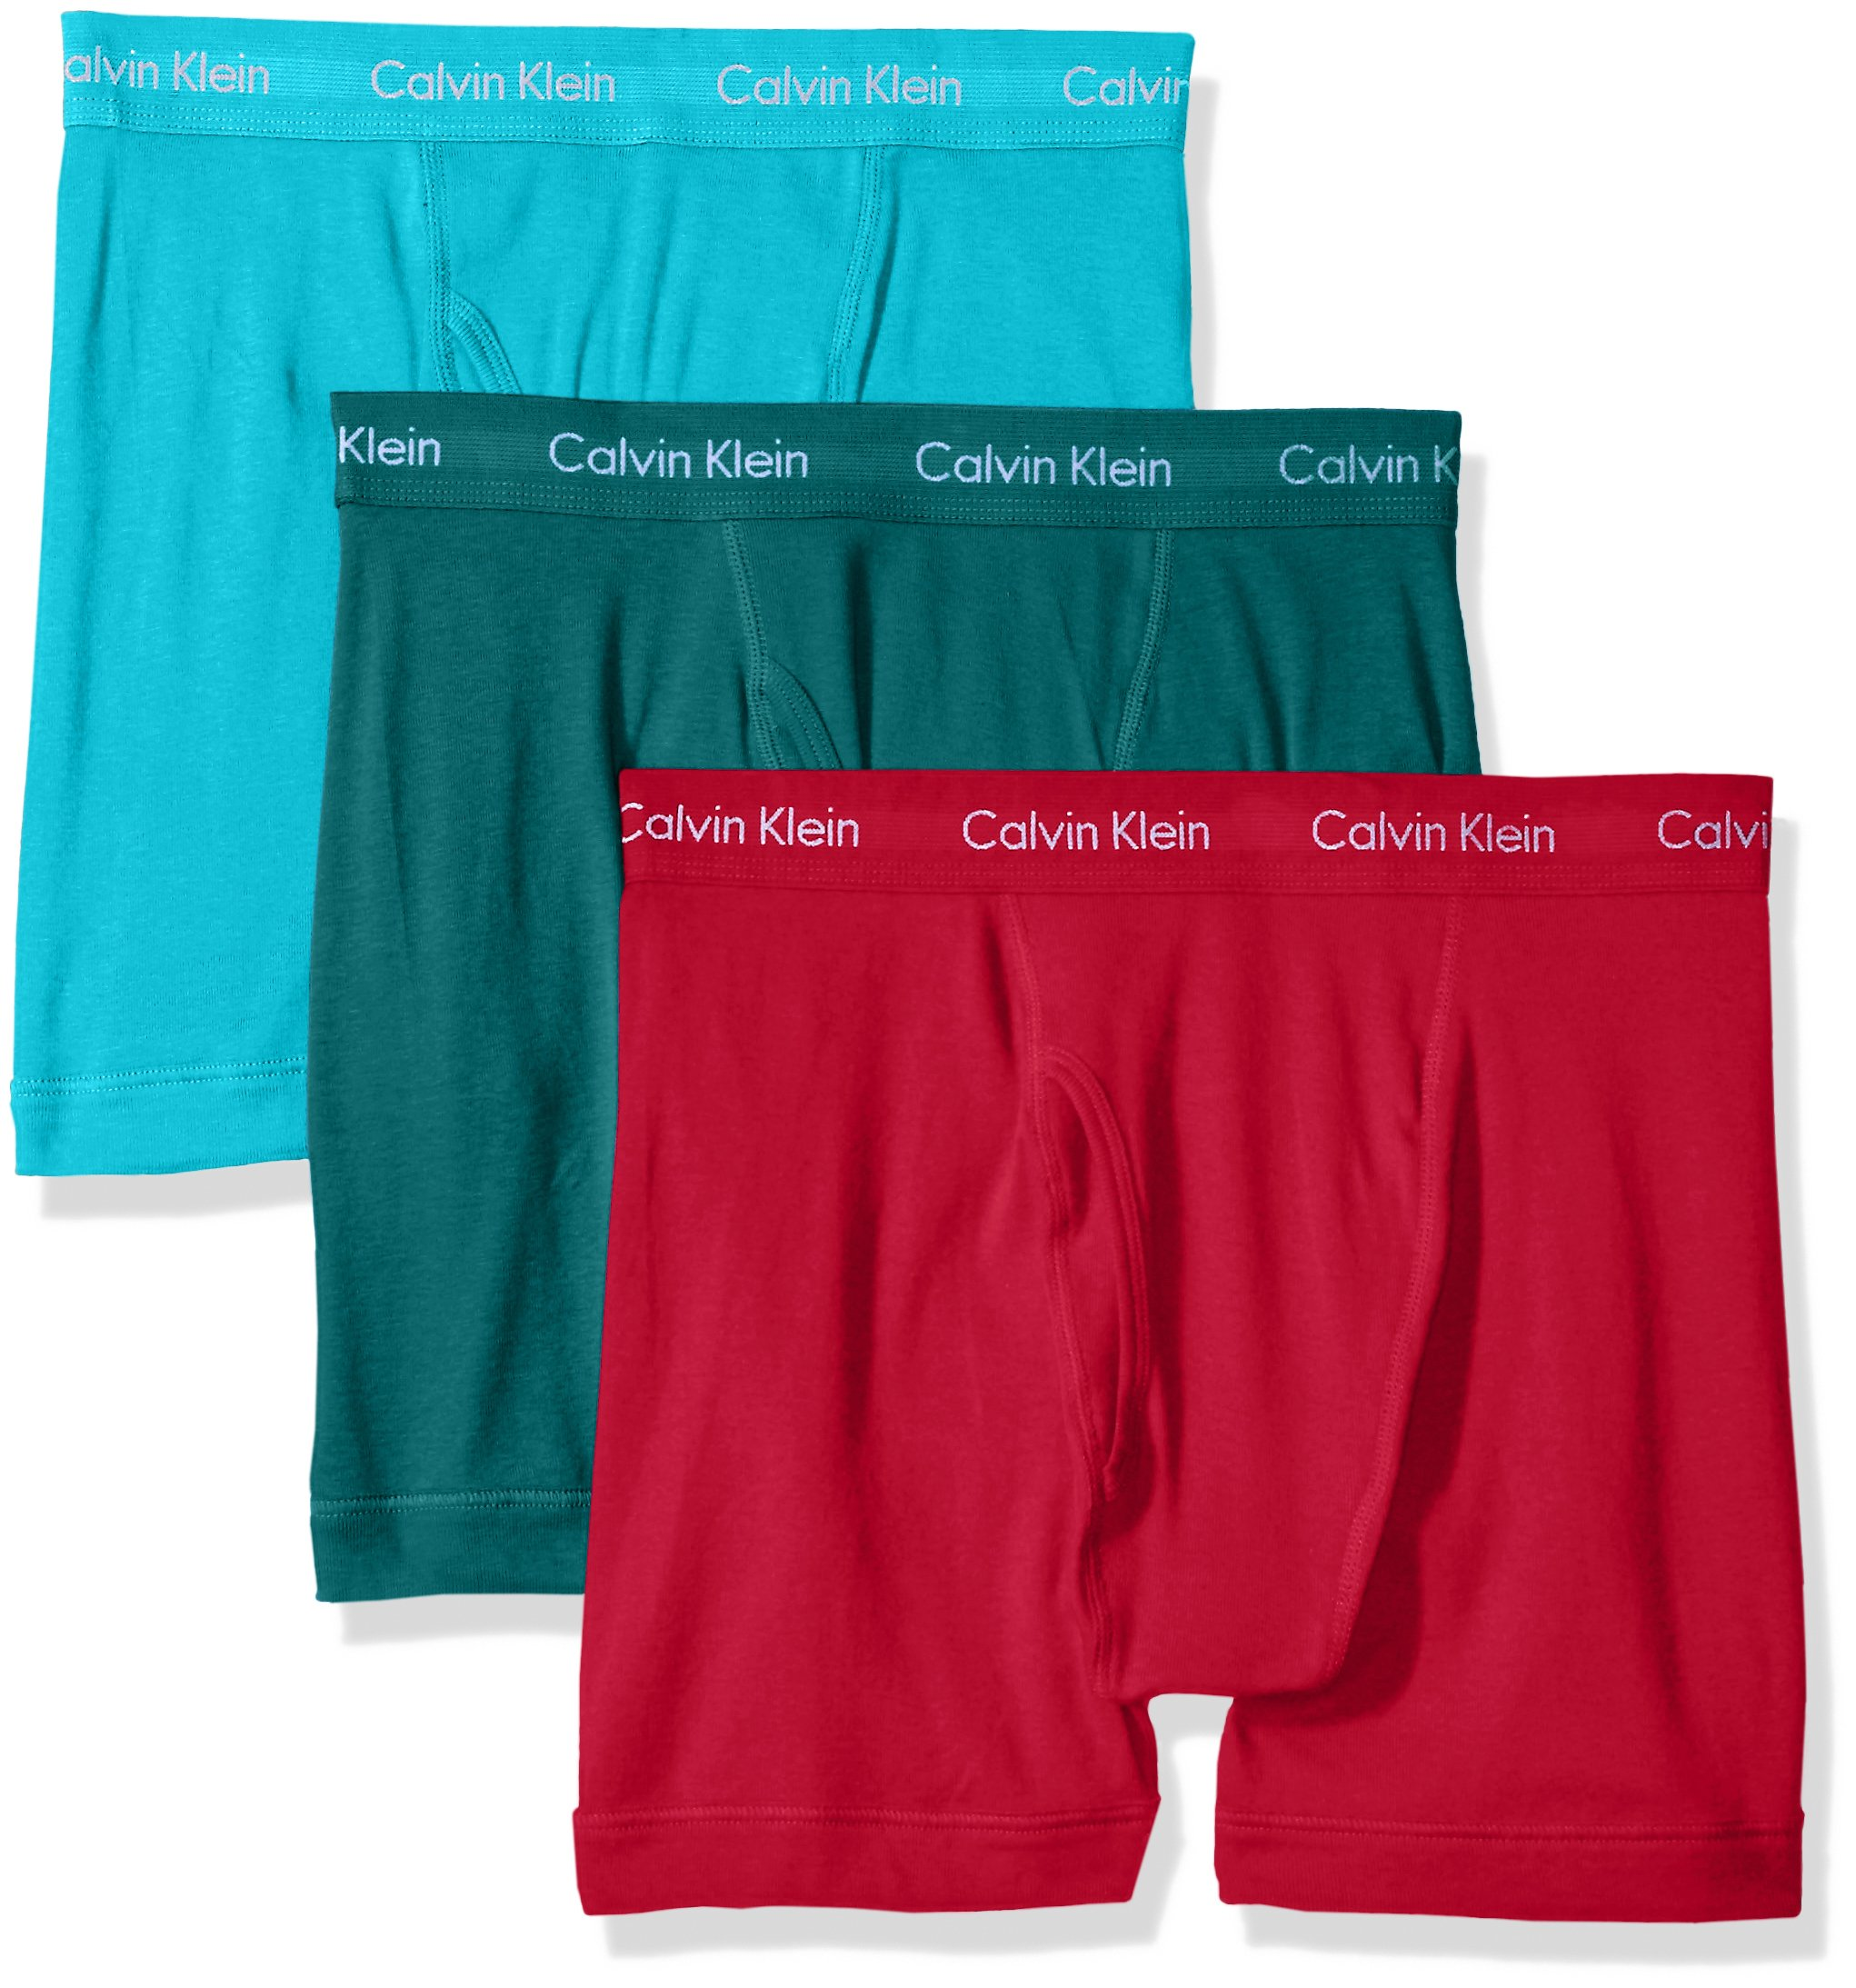 22a24edae443 Galleon - Calvin Klein Men's Underwear Cotton Classics Boxer Briefs - Large  - Dresden Blue/Sea Green/Amaranth (Pack Of 3)